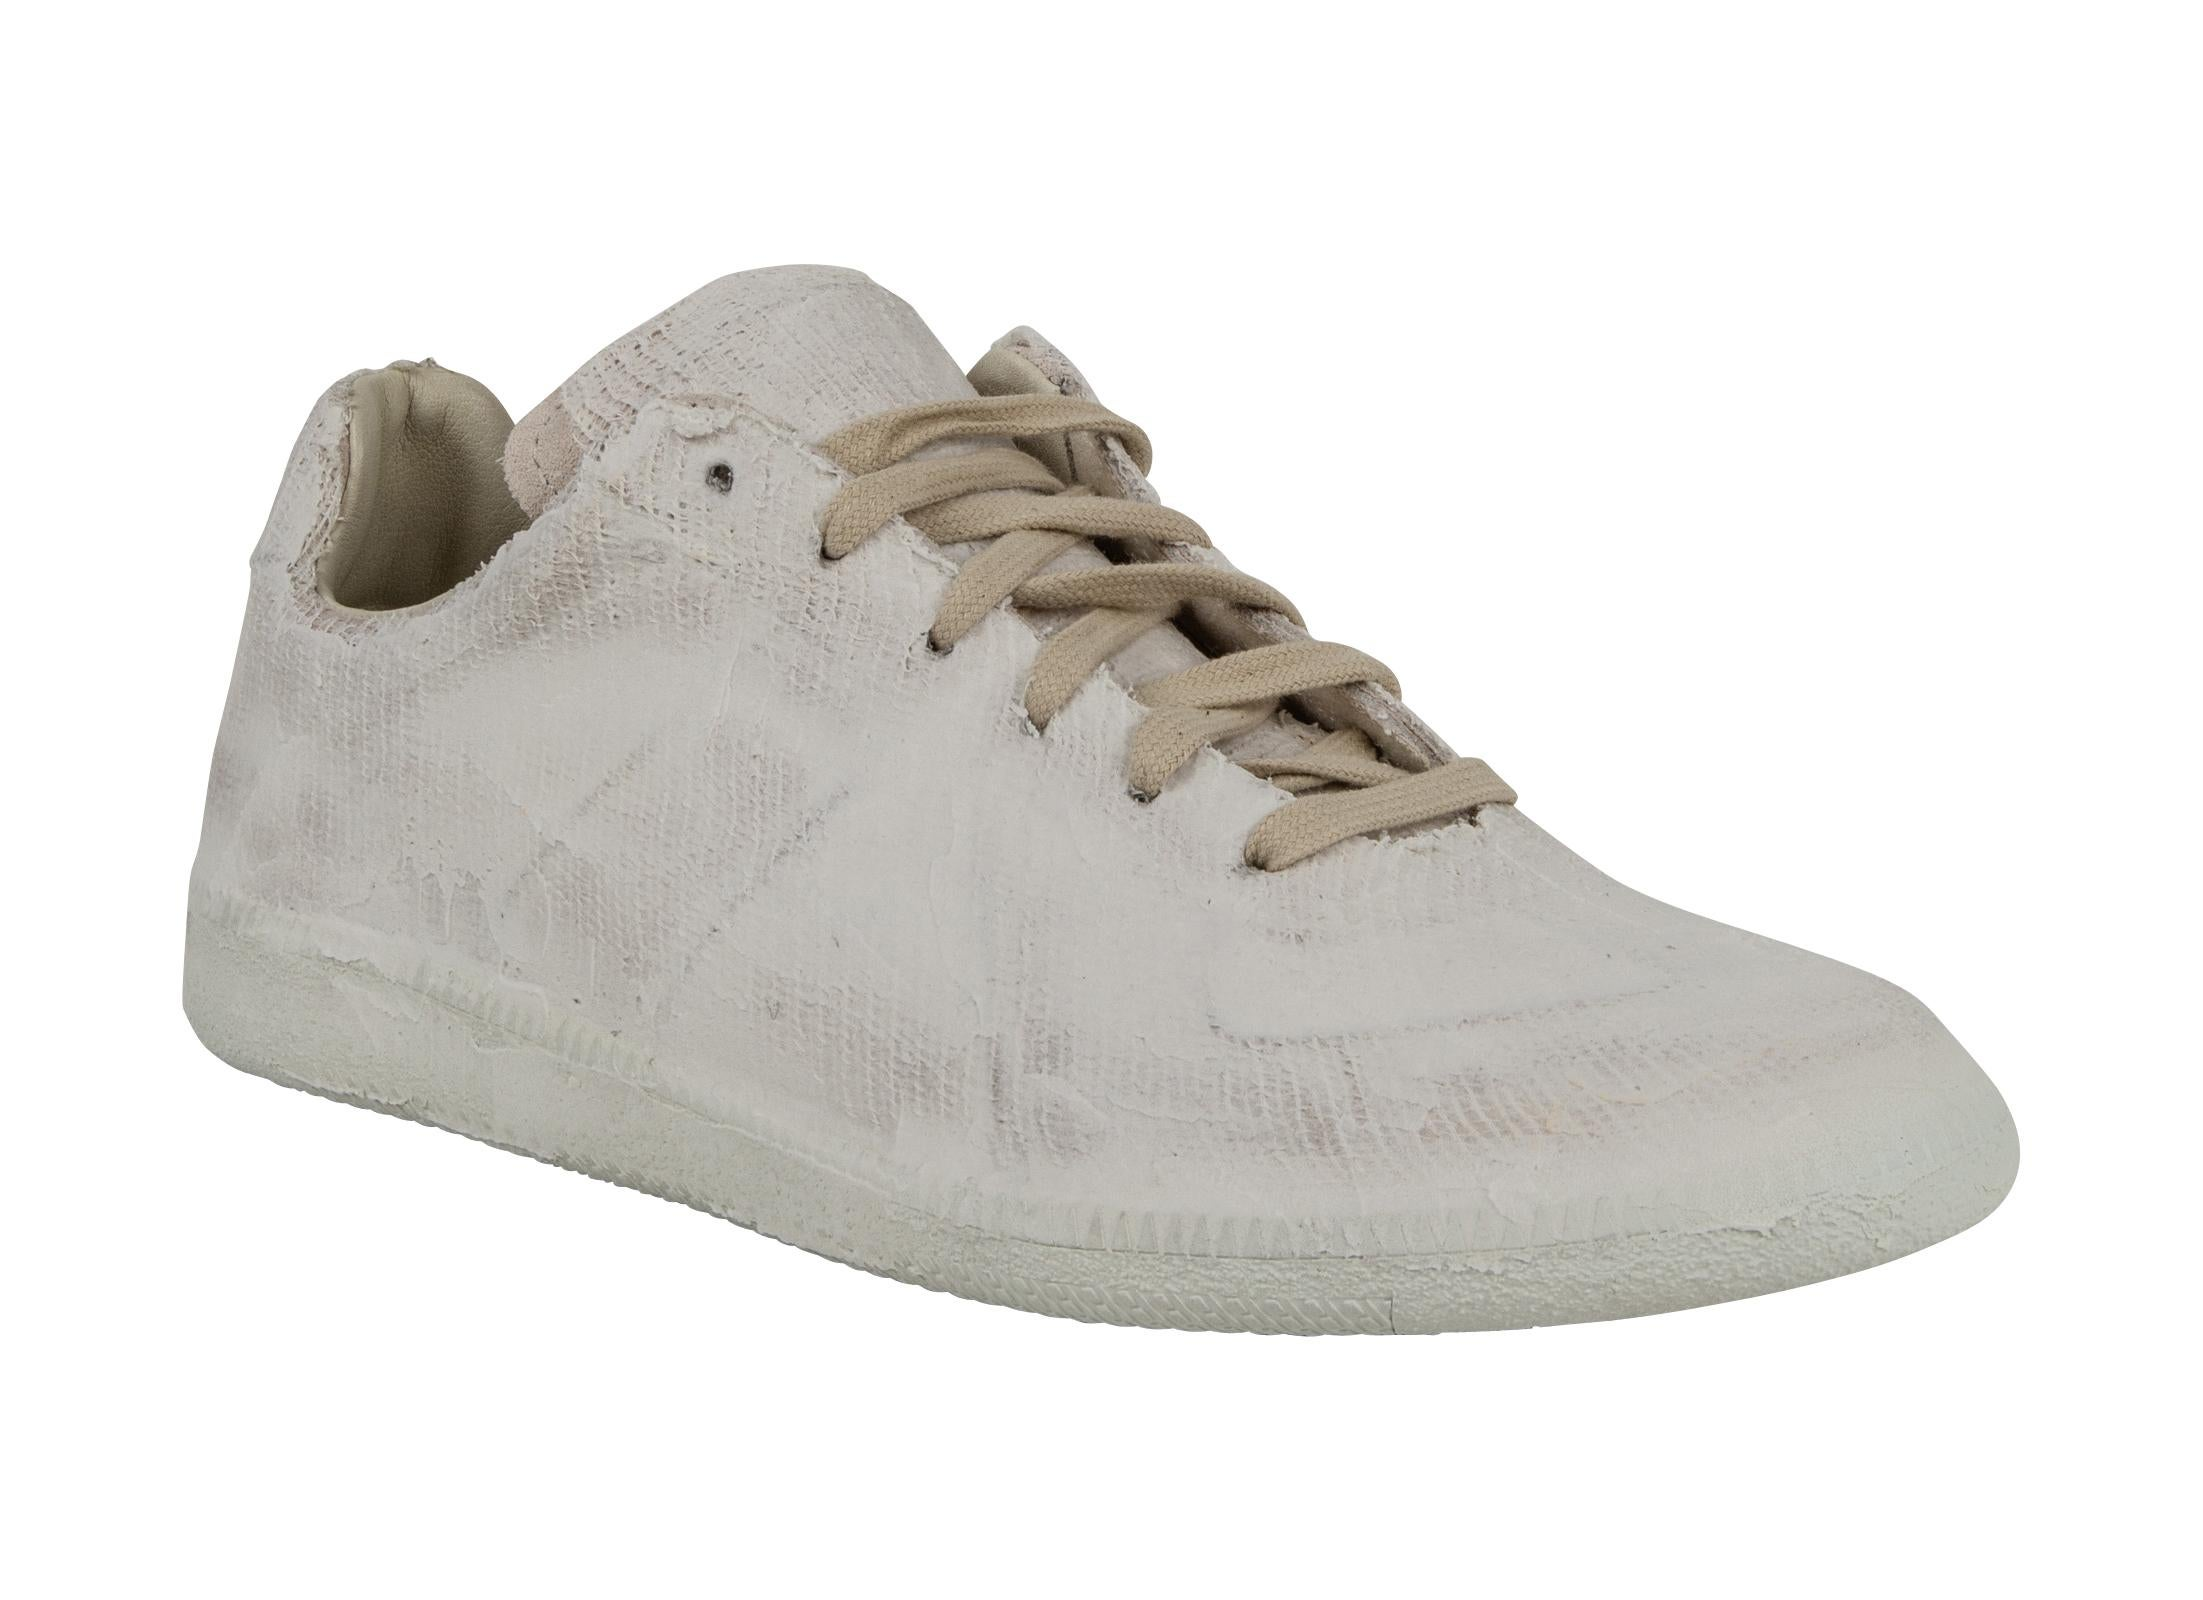 Finish Martin Sale Men's Margiela For Maison Sneaker White Paint 43 wv1qdXn4x